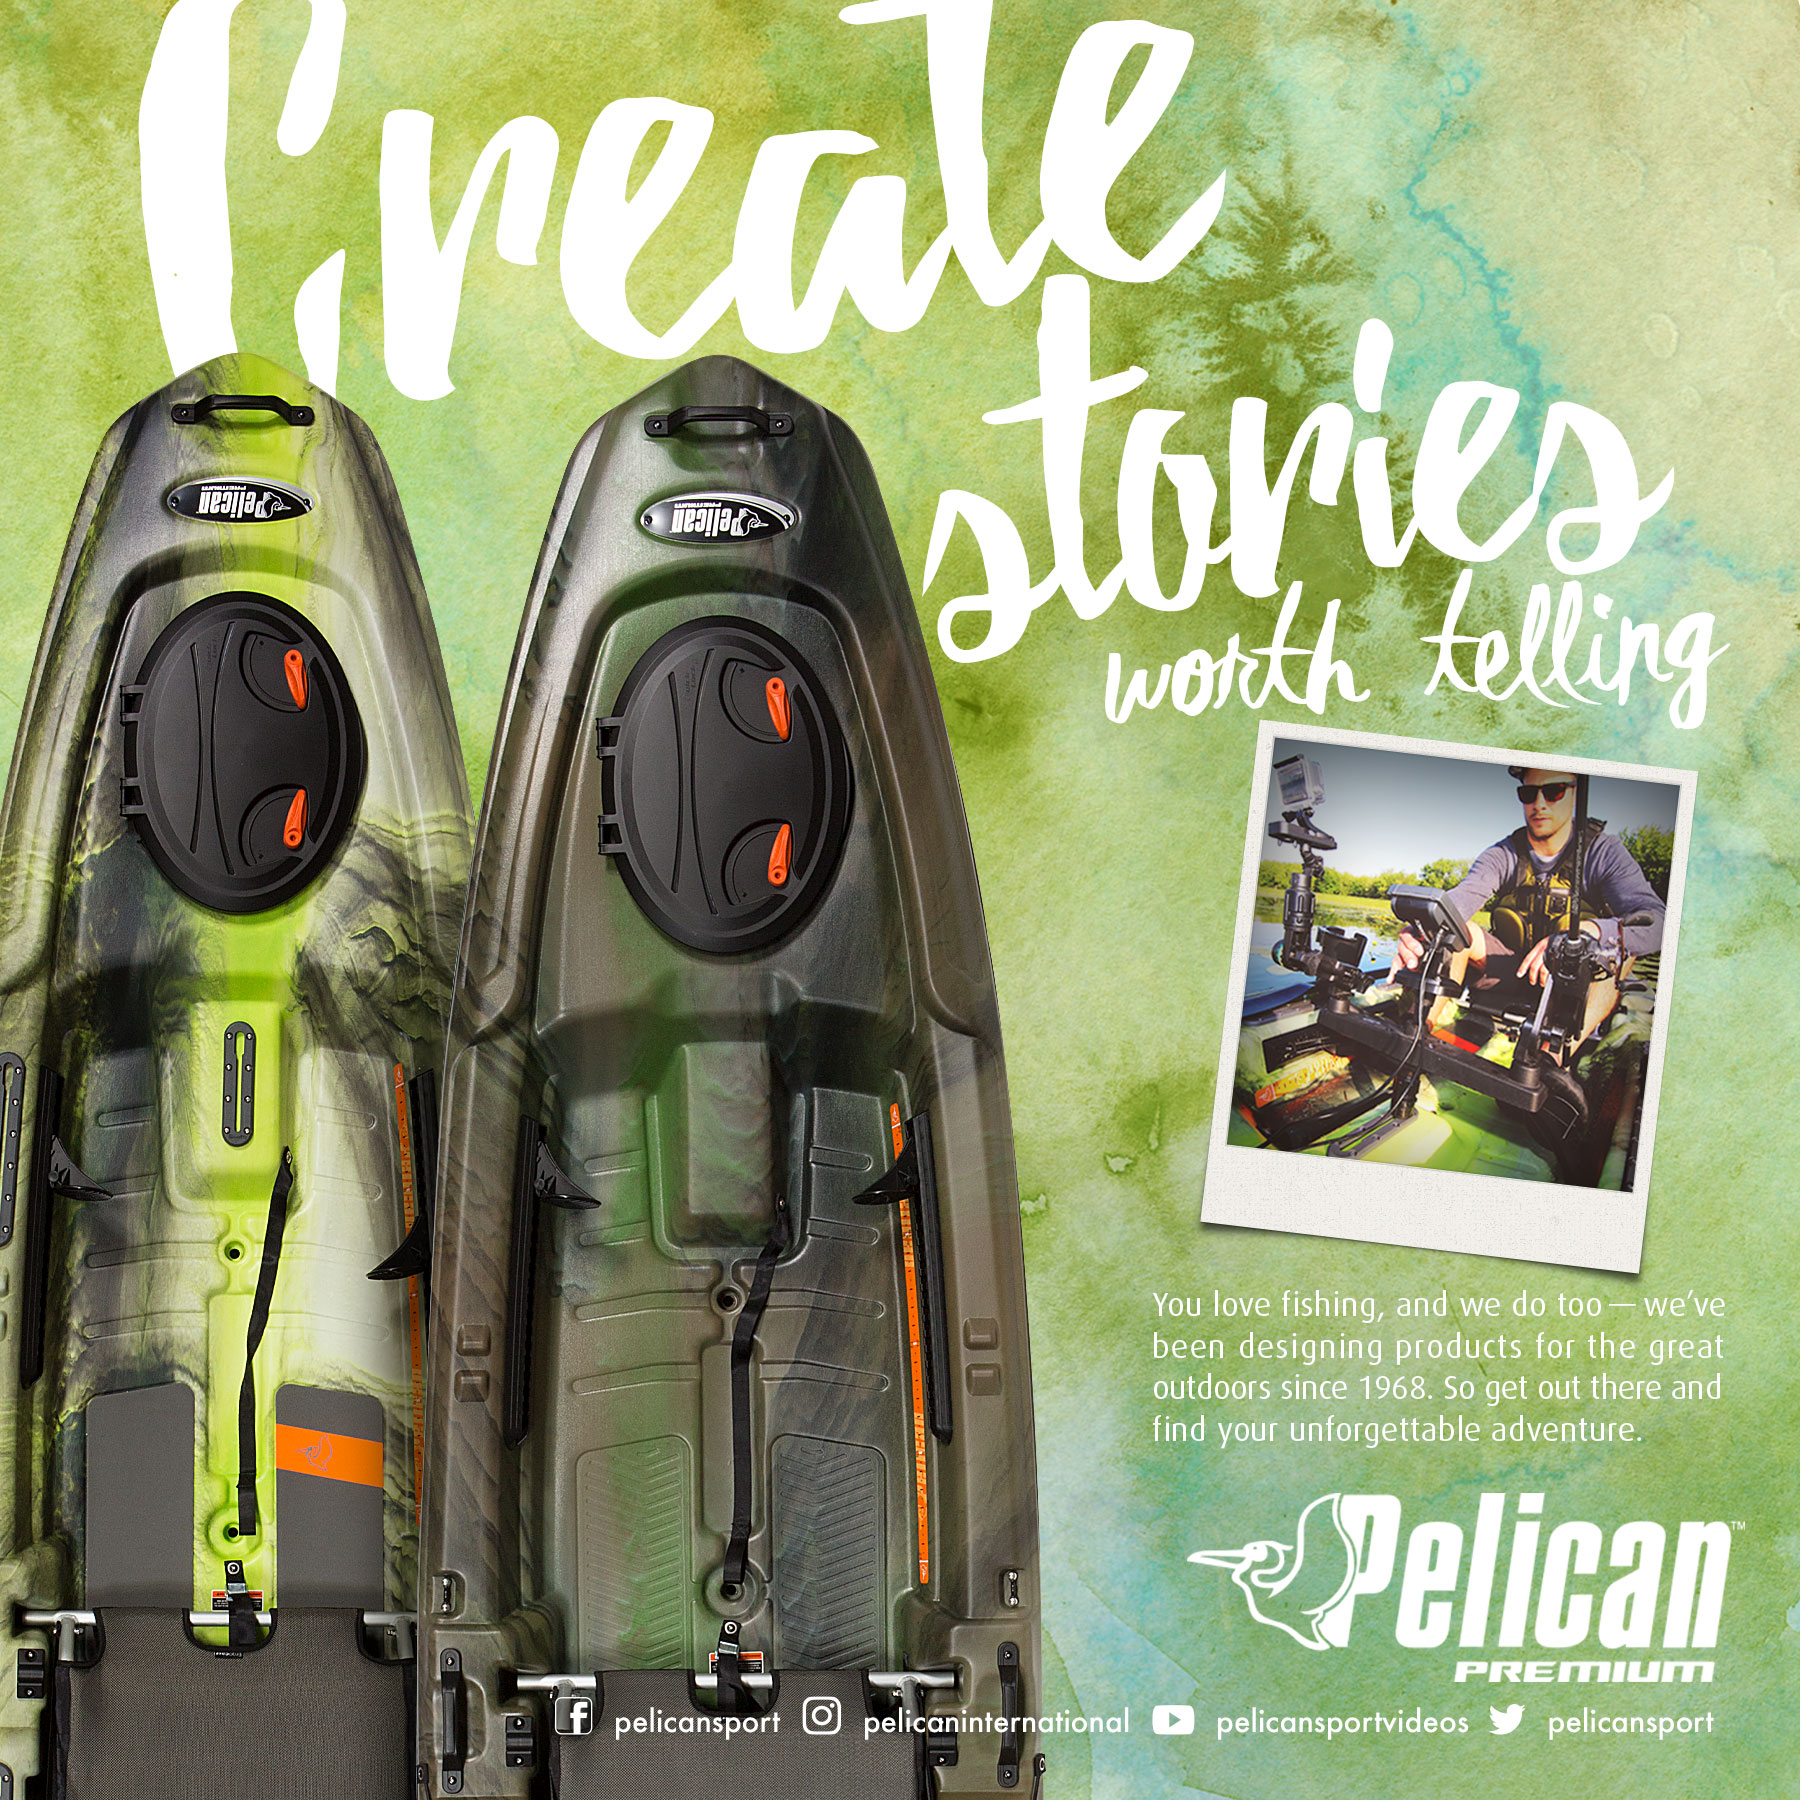 Pelican Fishing Block Ad 1200x1200